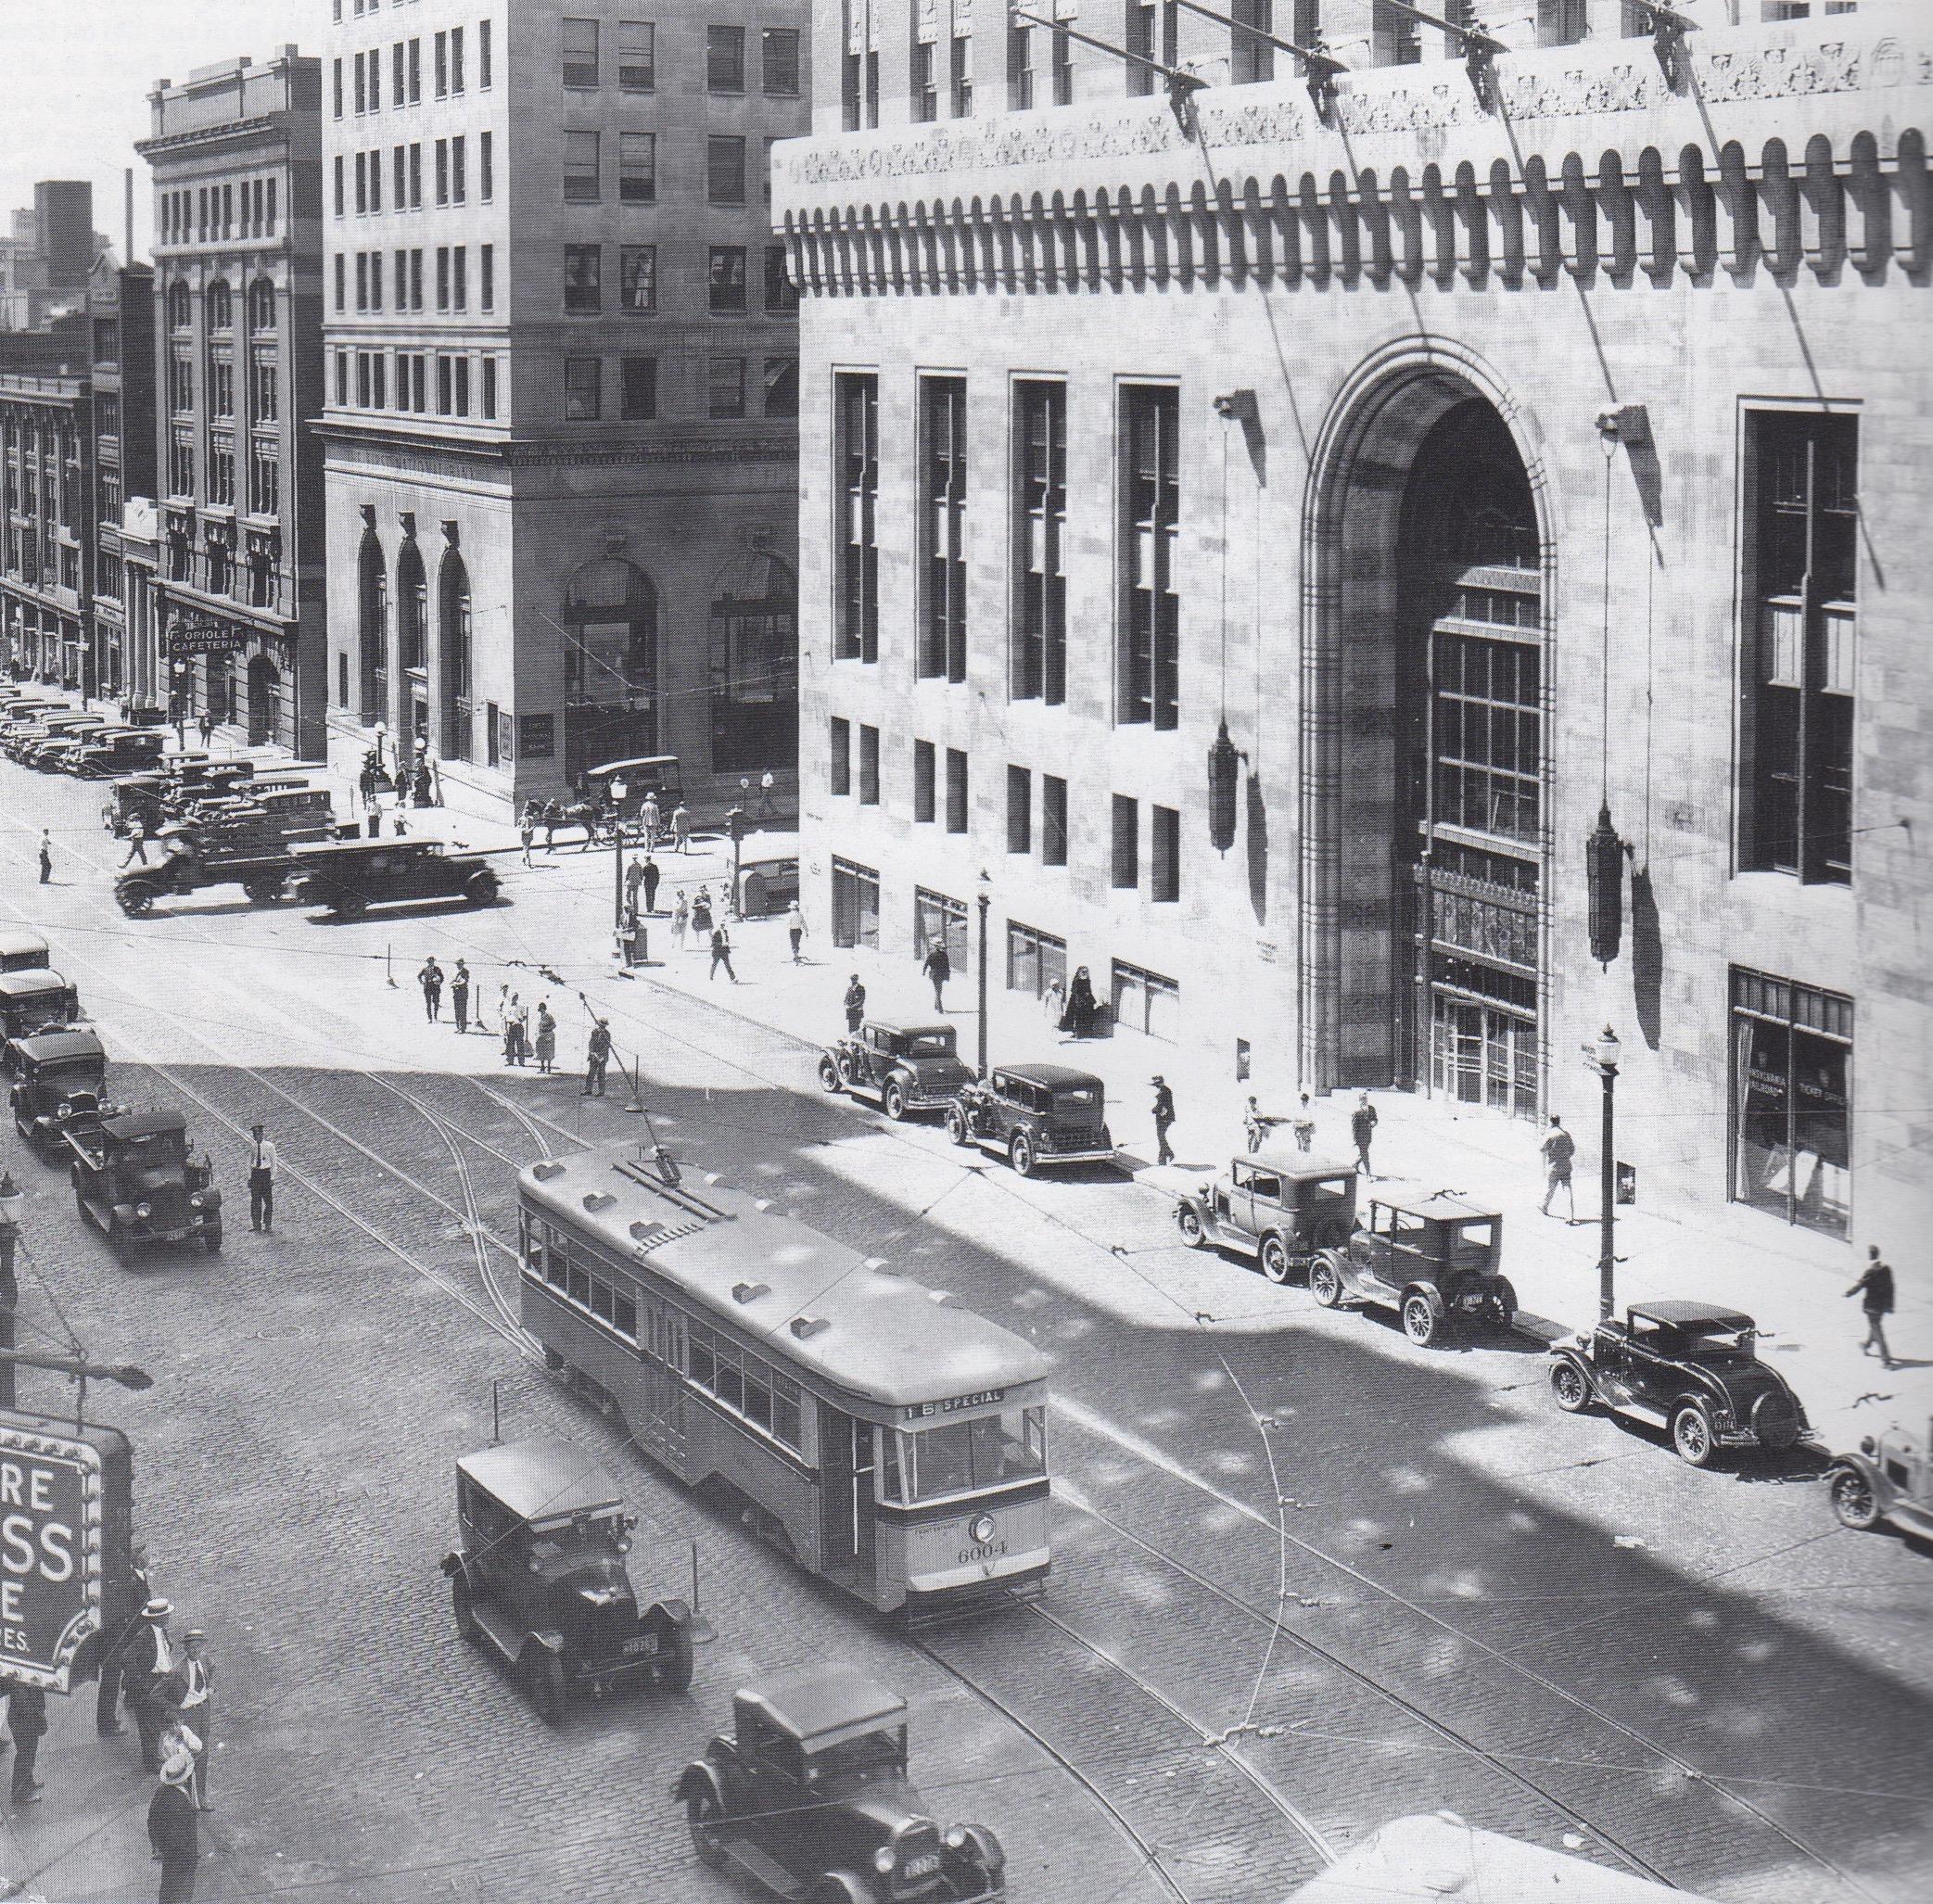 Image Credit: Louis C Mueller Collection, Baltimore Trust Building, 1930